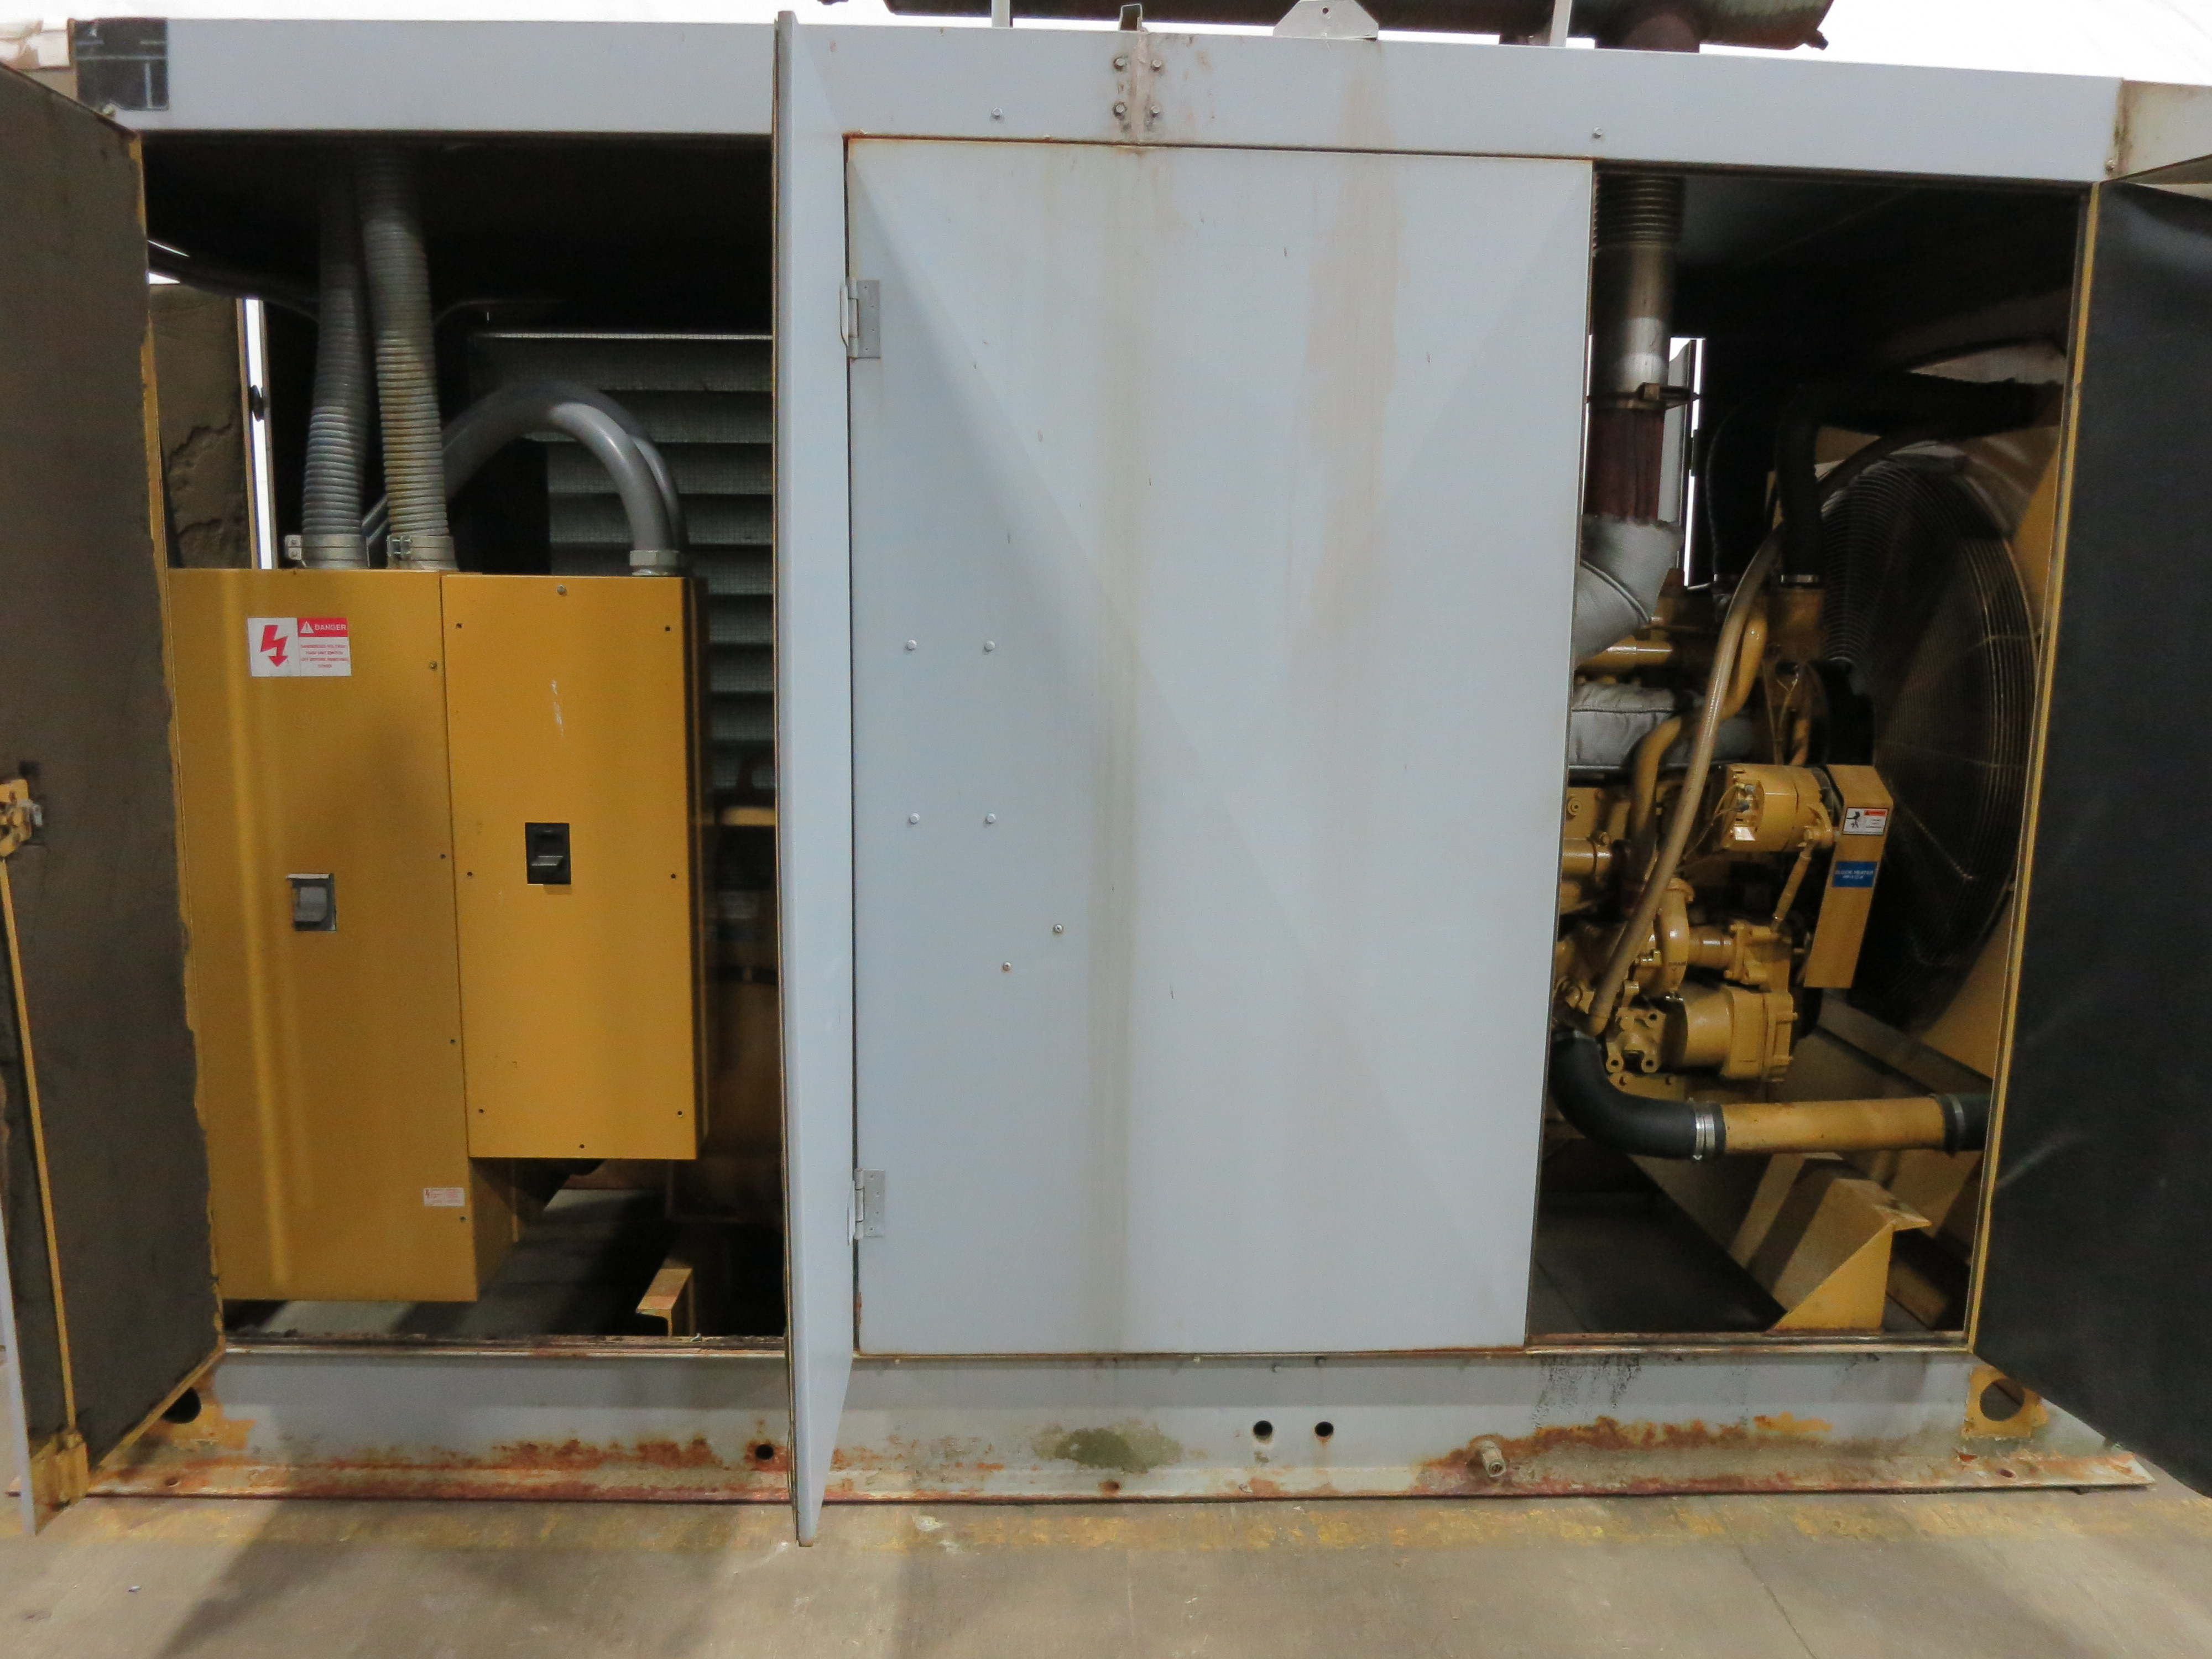 Used Katolight KTA19-G2 Diesel Generator   392 Hrs   400 KW   0 Price   CSDG